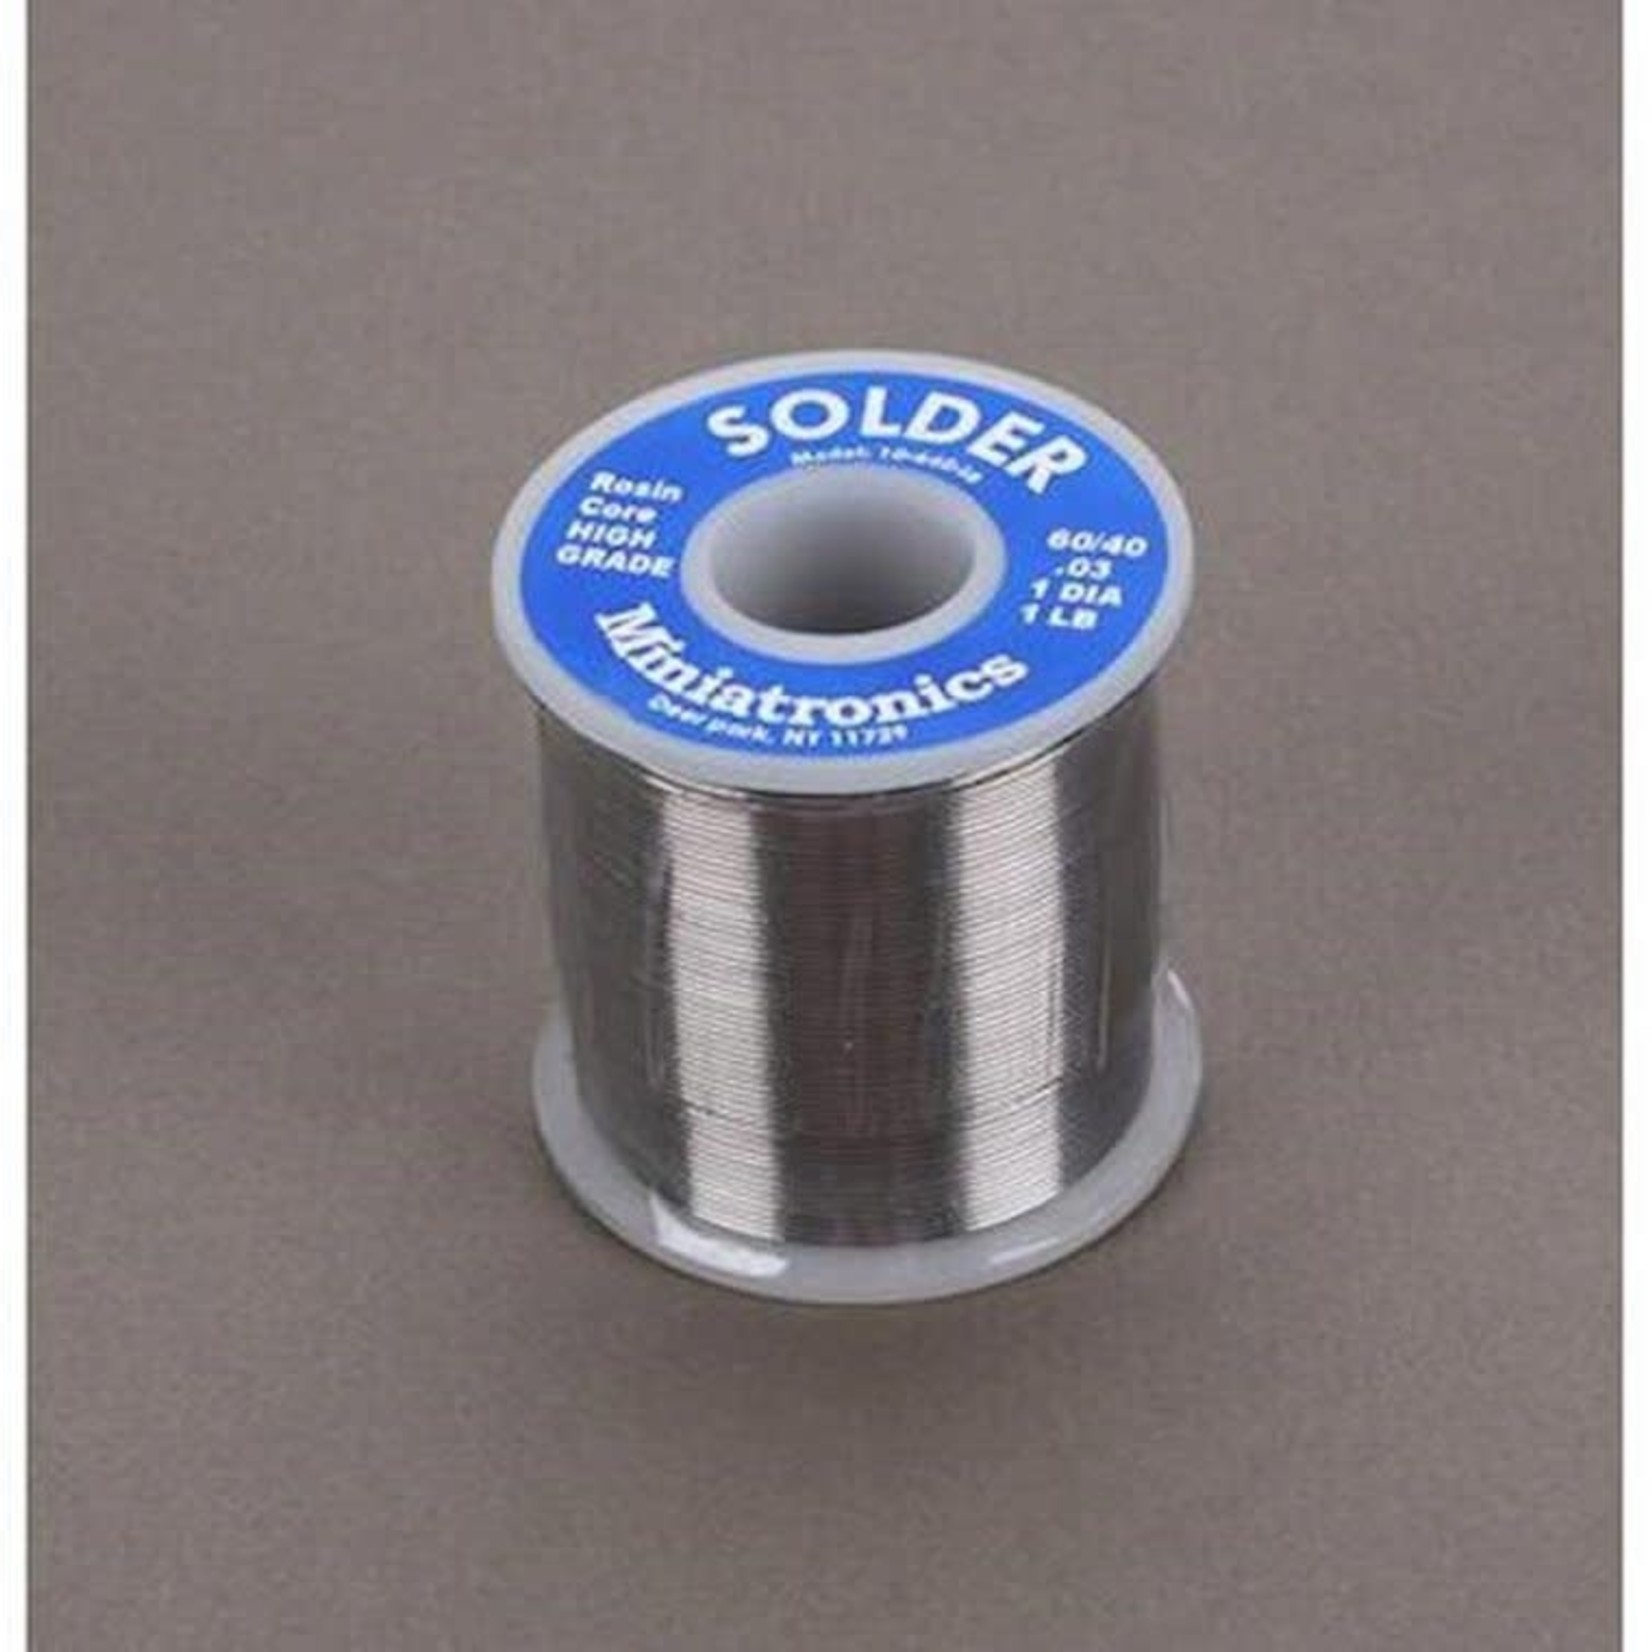 Miniatronics MNT1064016 Miniatronics Corp Rosin Core Solder 60/40, 1 lb